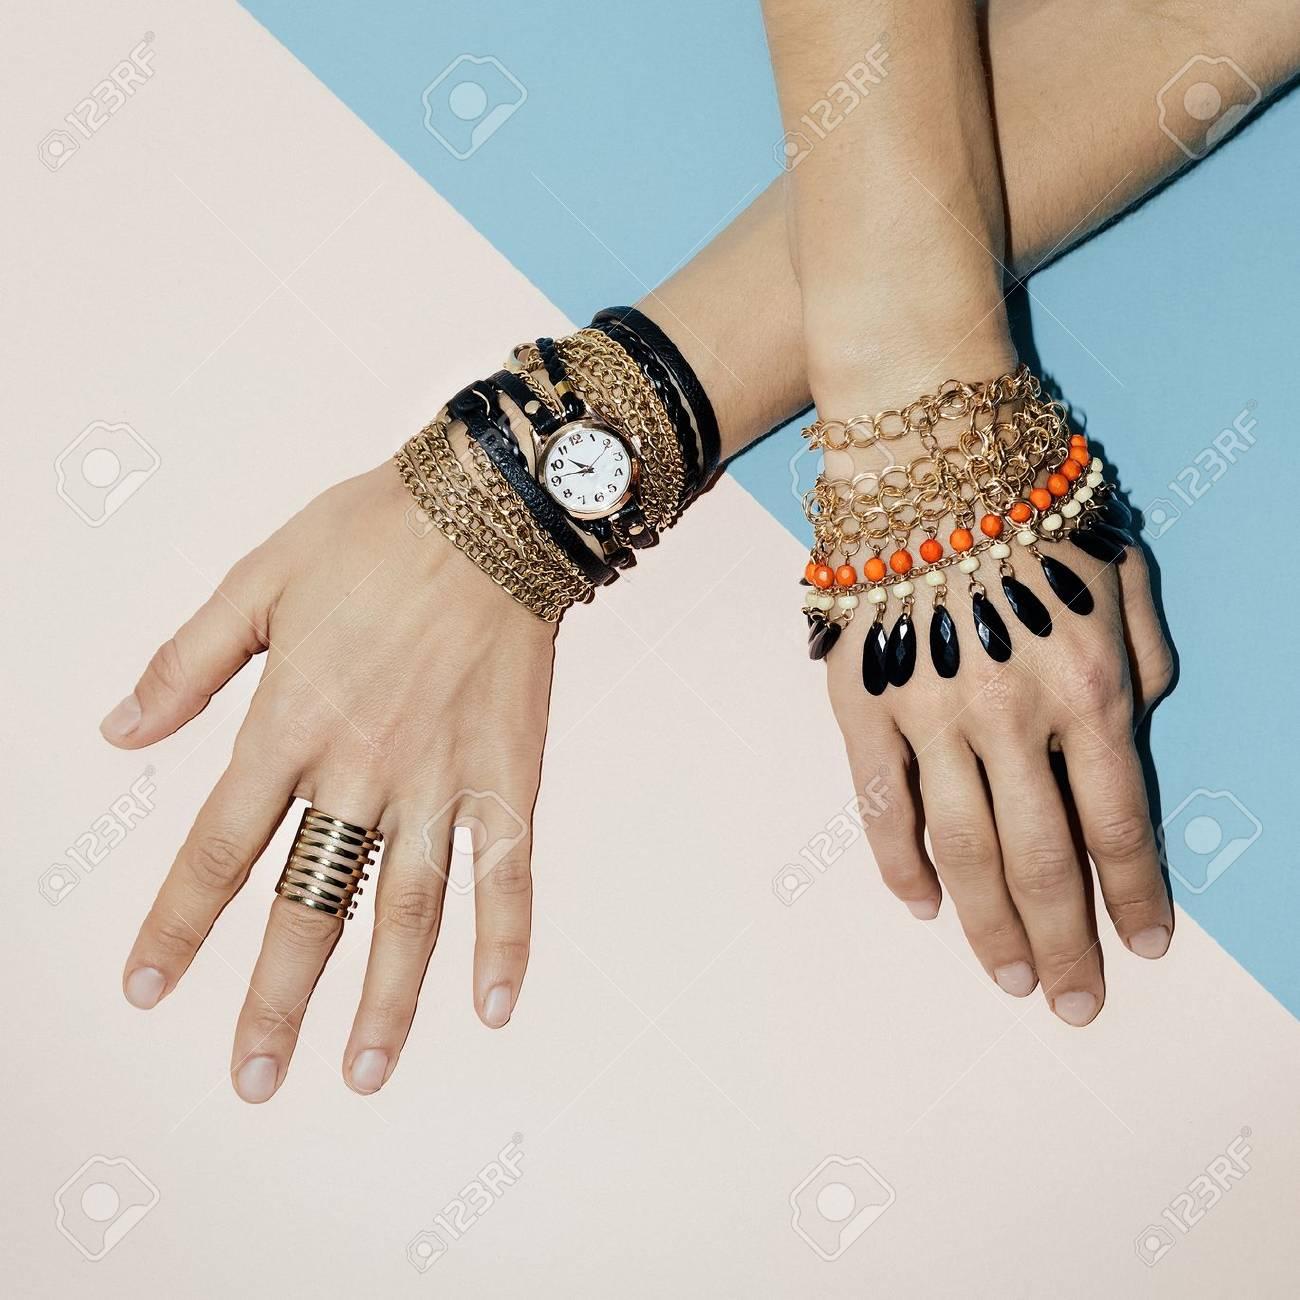 e9753d750a45 Moda de joyería negra. Pulseras, relojes y anillos. Sé elegante dama.